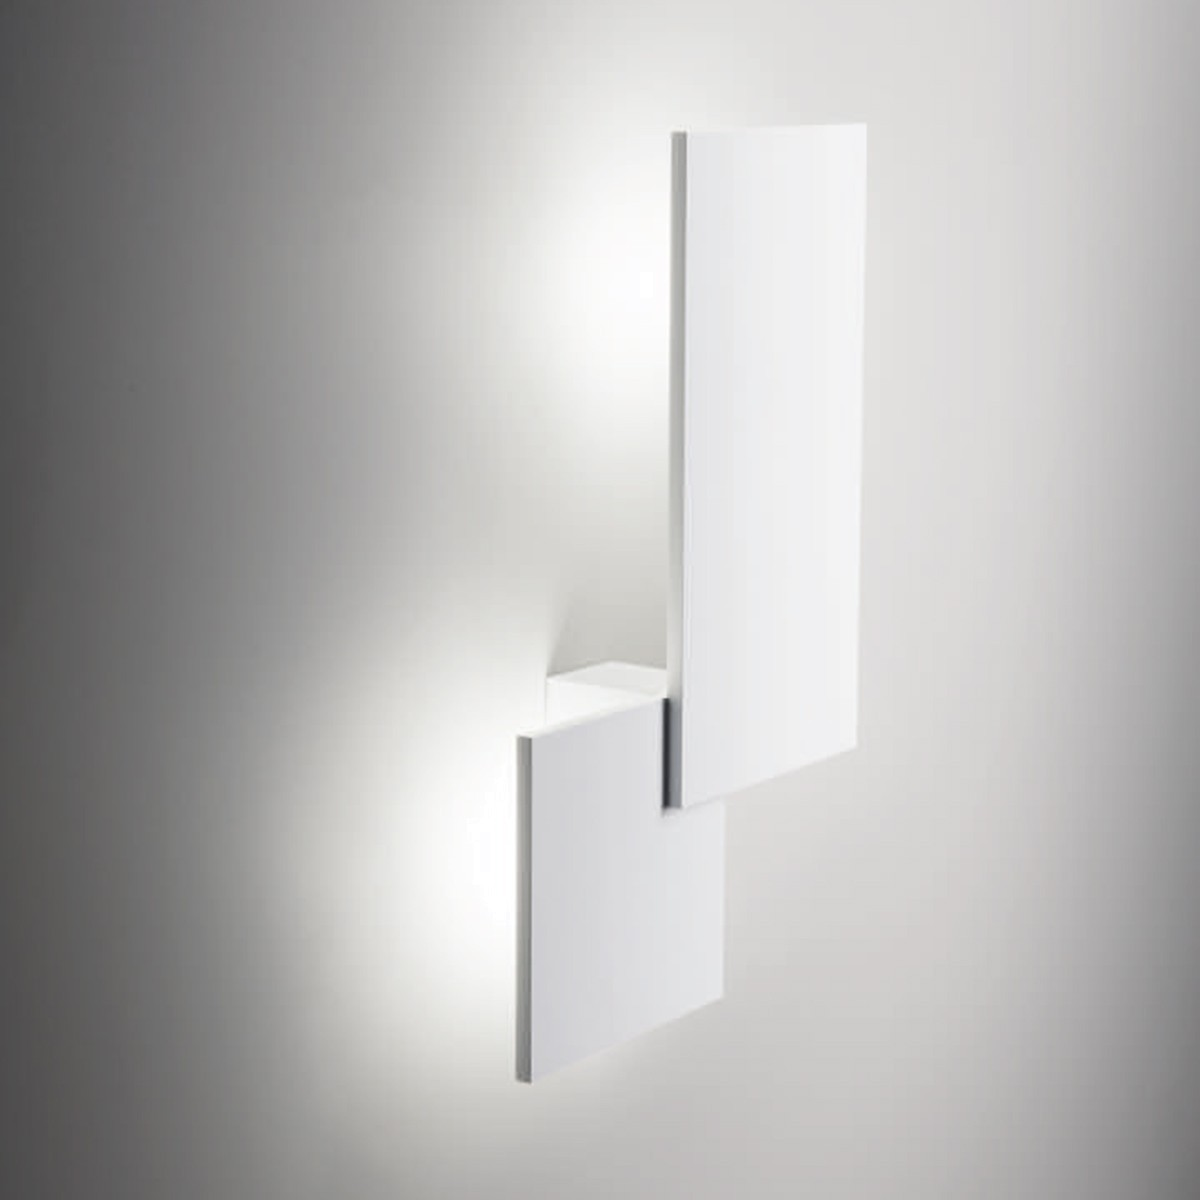 Studio Italia Design Puzzle Square & Rectangle Wand - / Deckenleuchte, weiß matt, 3000° K